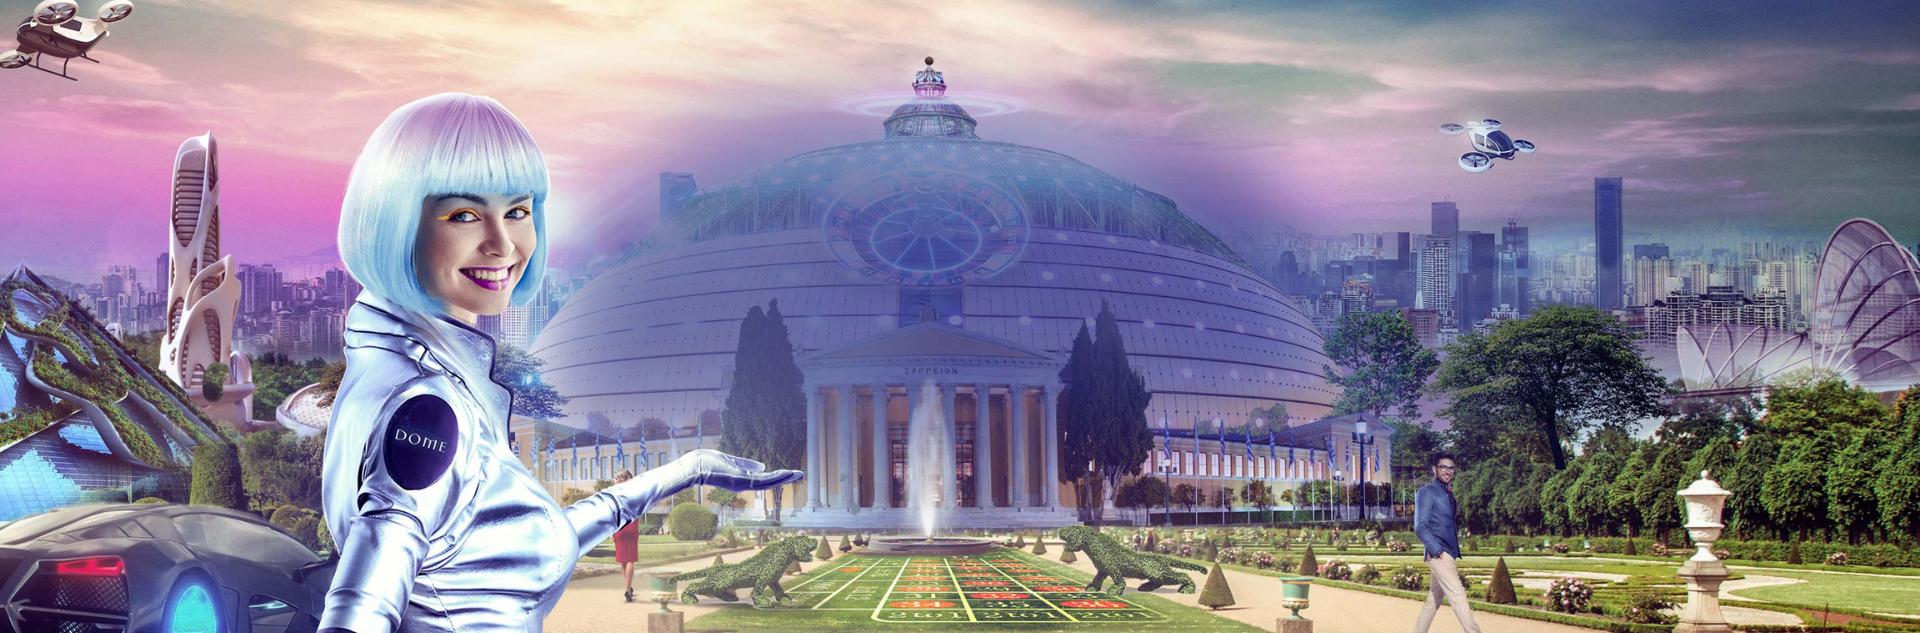 Casino Dome casino review CA